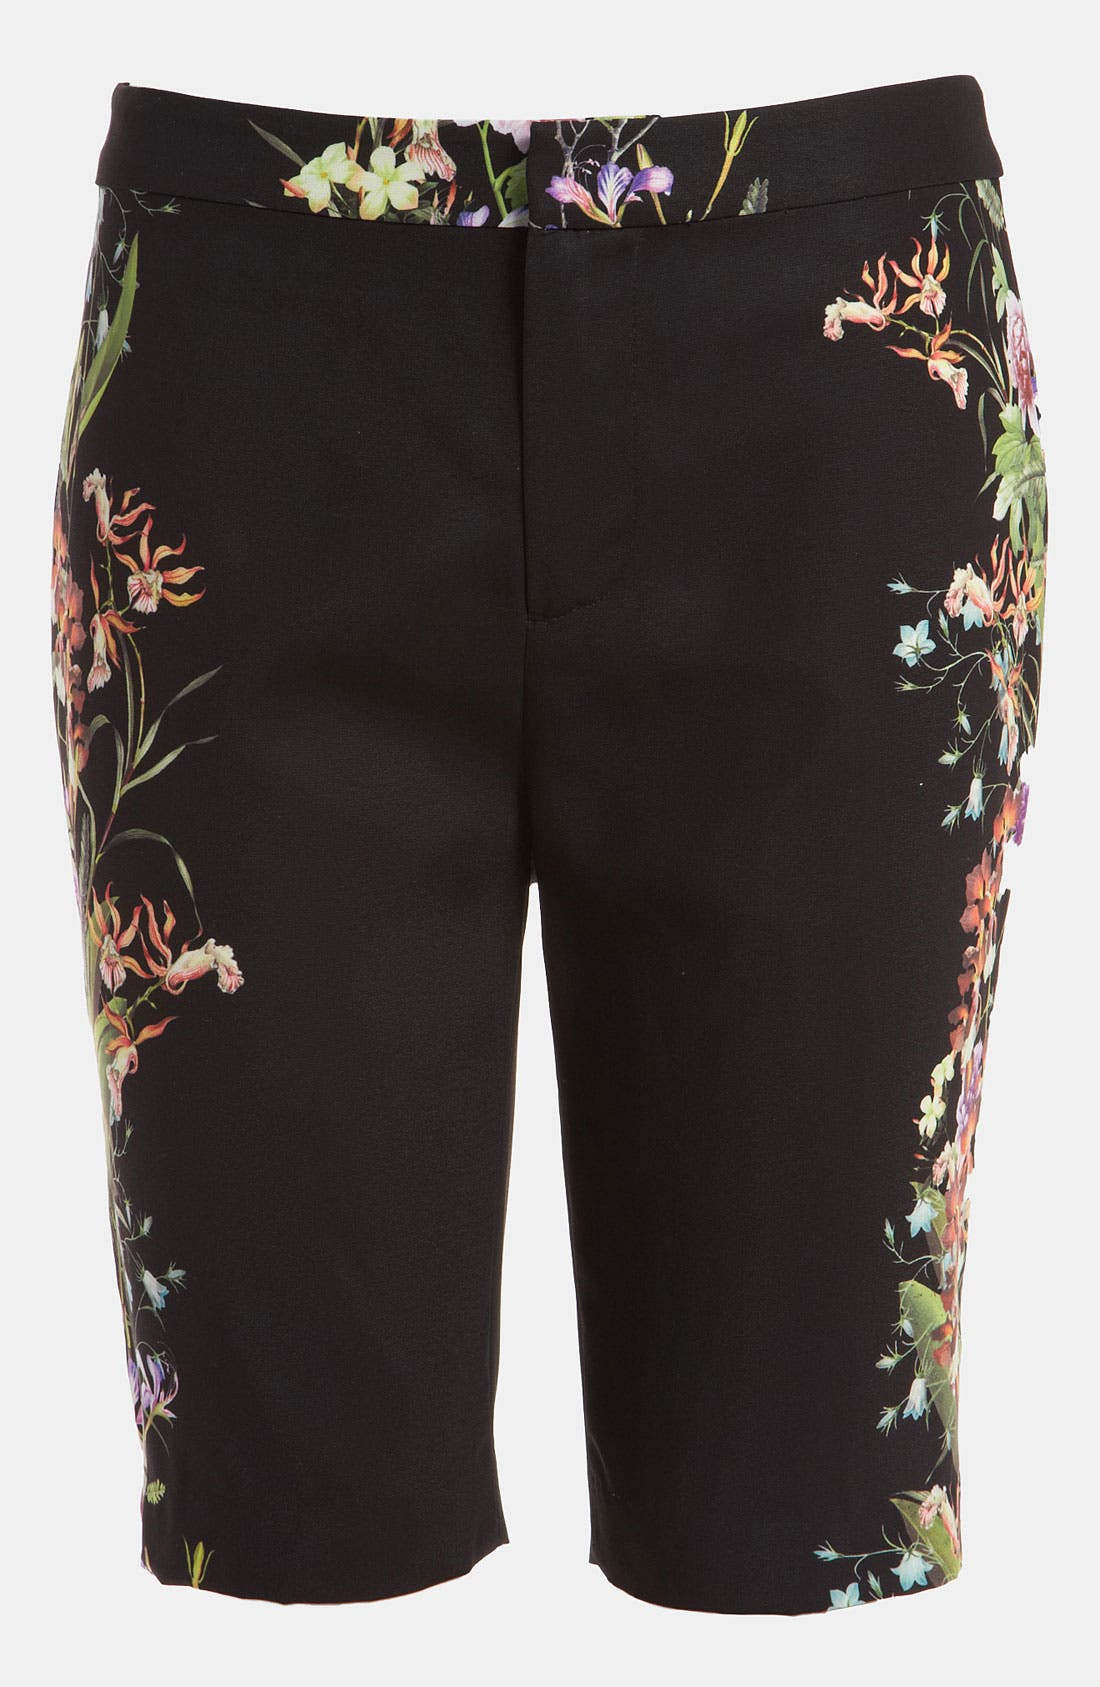 Main Image - Mural Flower Print Shorts